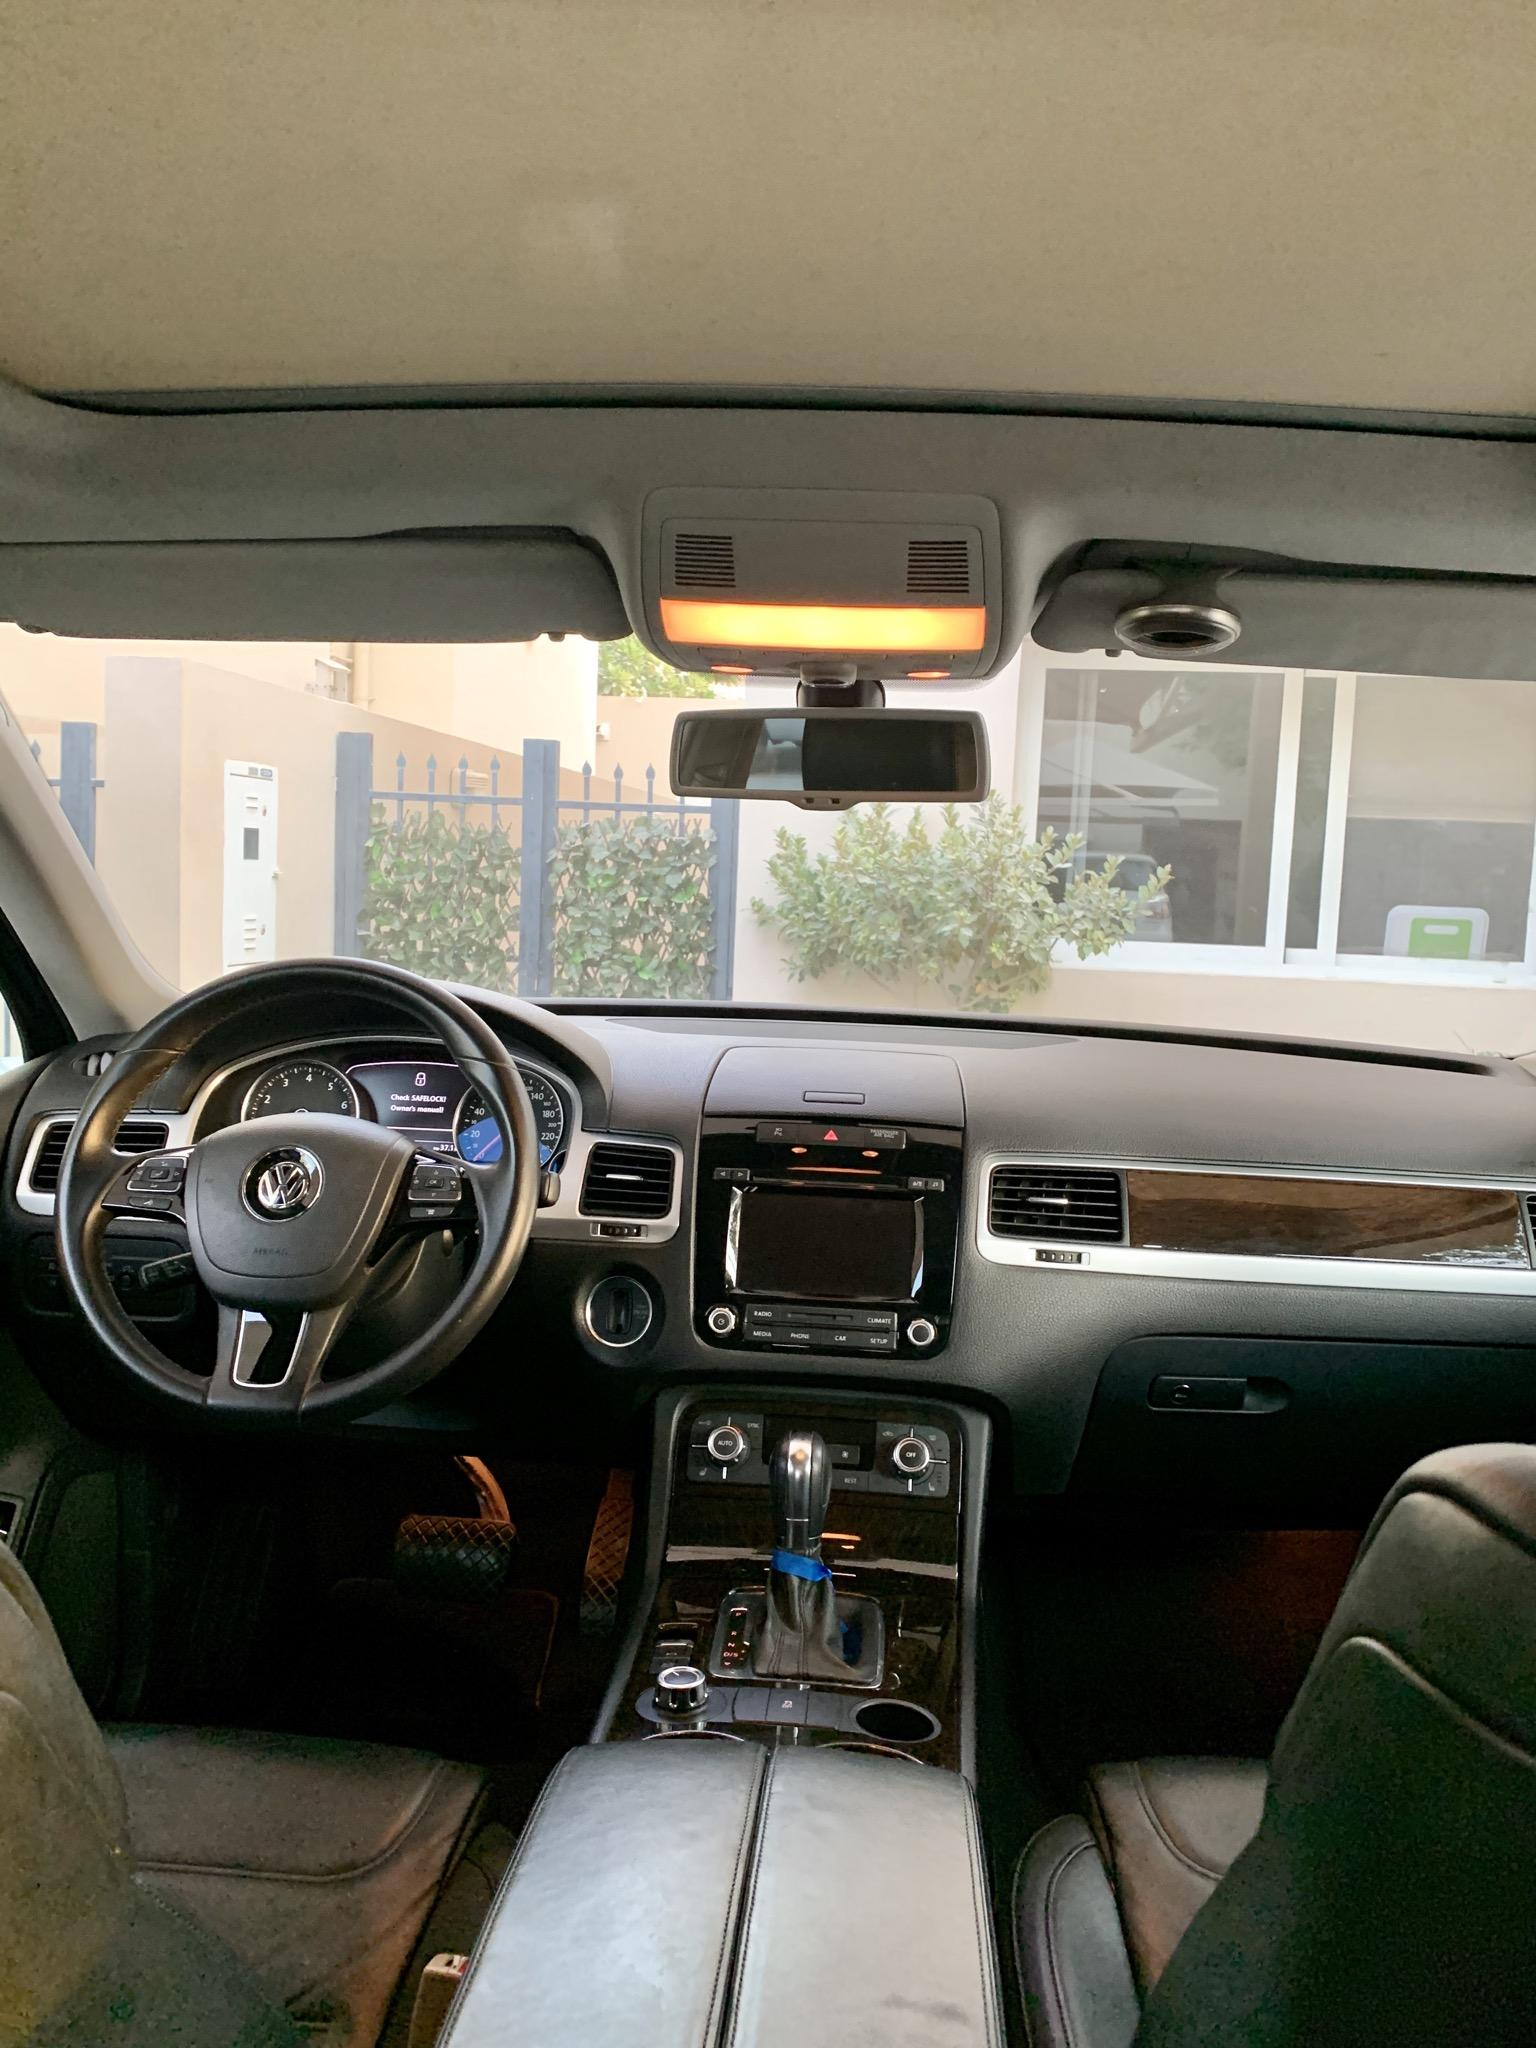 VW Touareg 2014 SEL